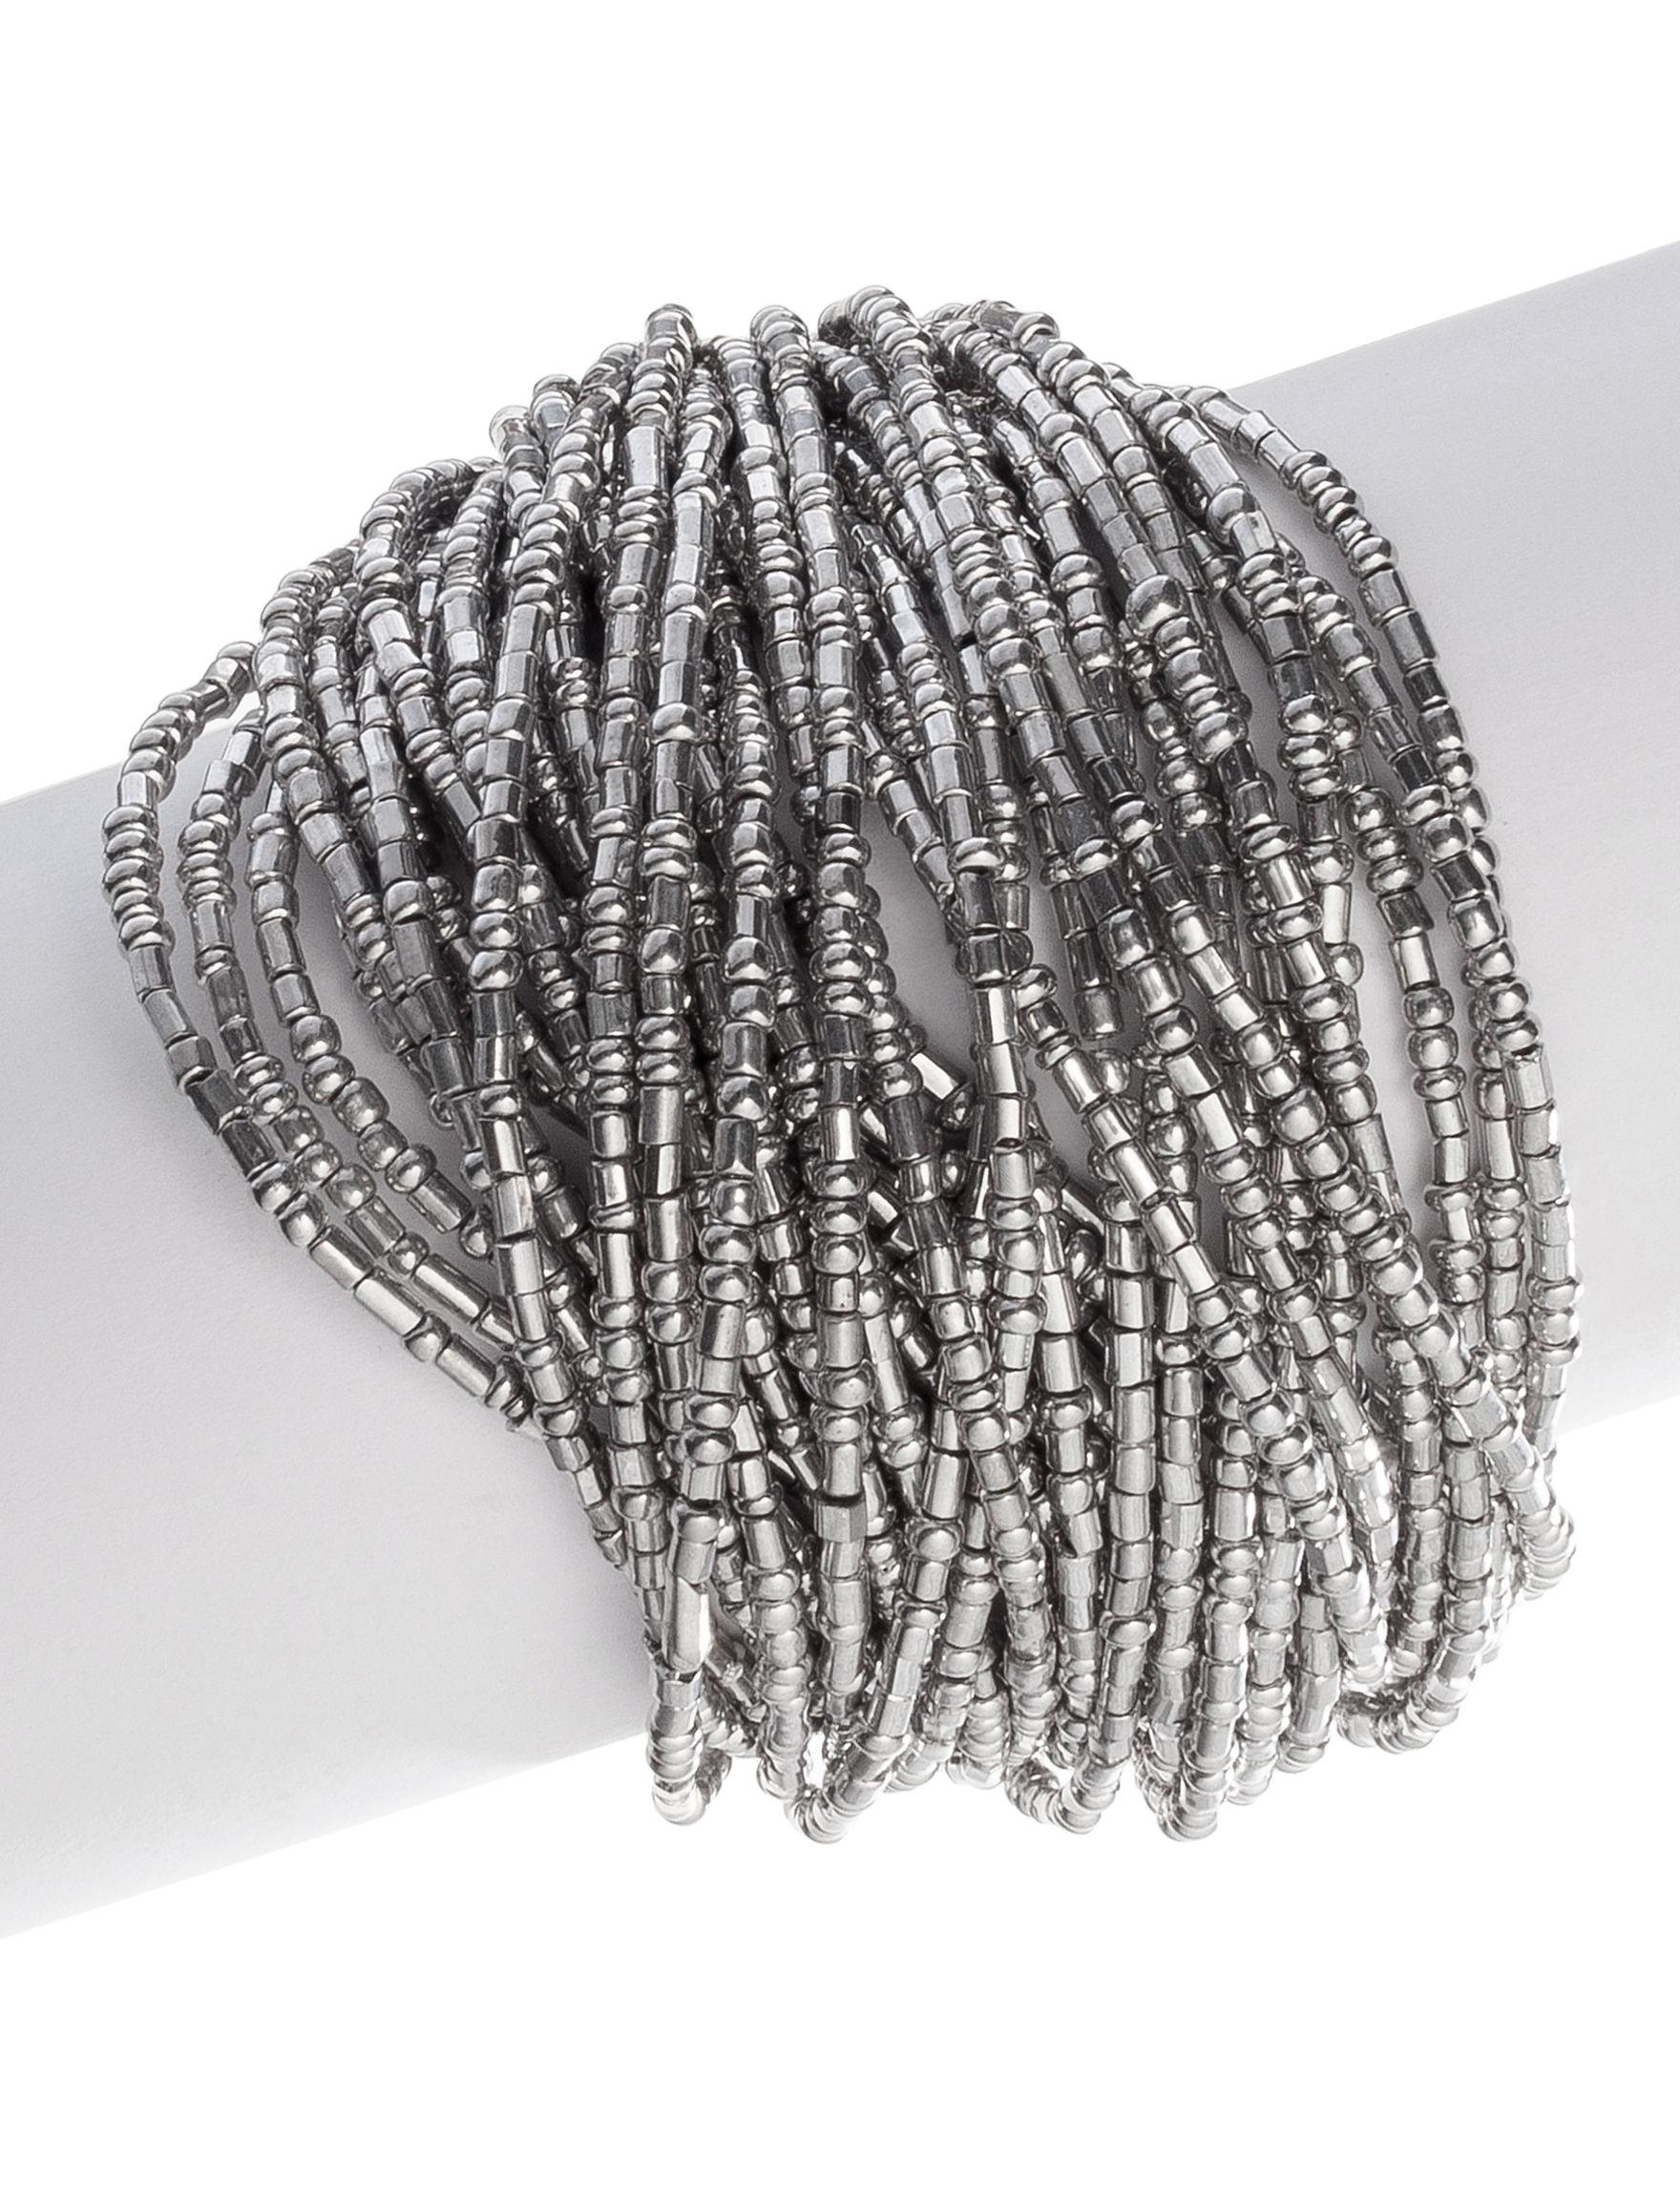 Signature Studio Silver Bracelets Fashion Jewelry